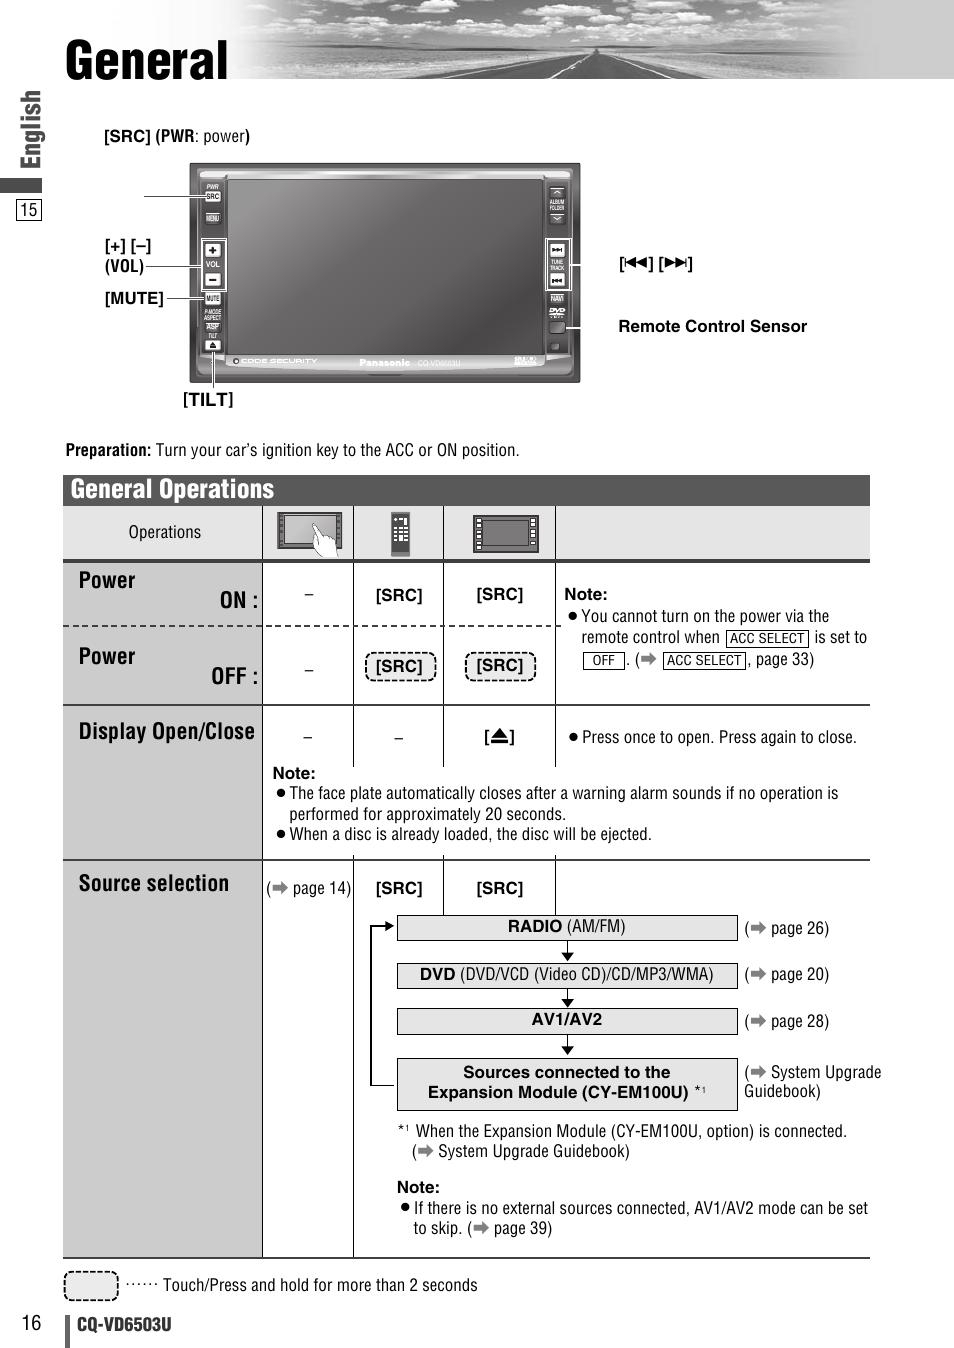 Panasonic Cq Vd6503u Wiring Diagram Library Rx400u General English Operations User Manual Page 16